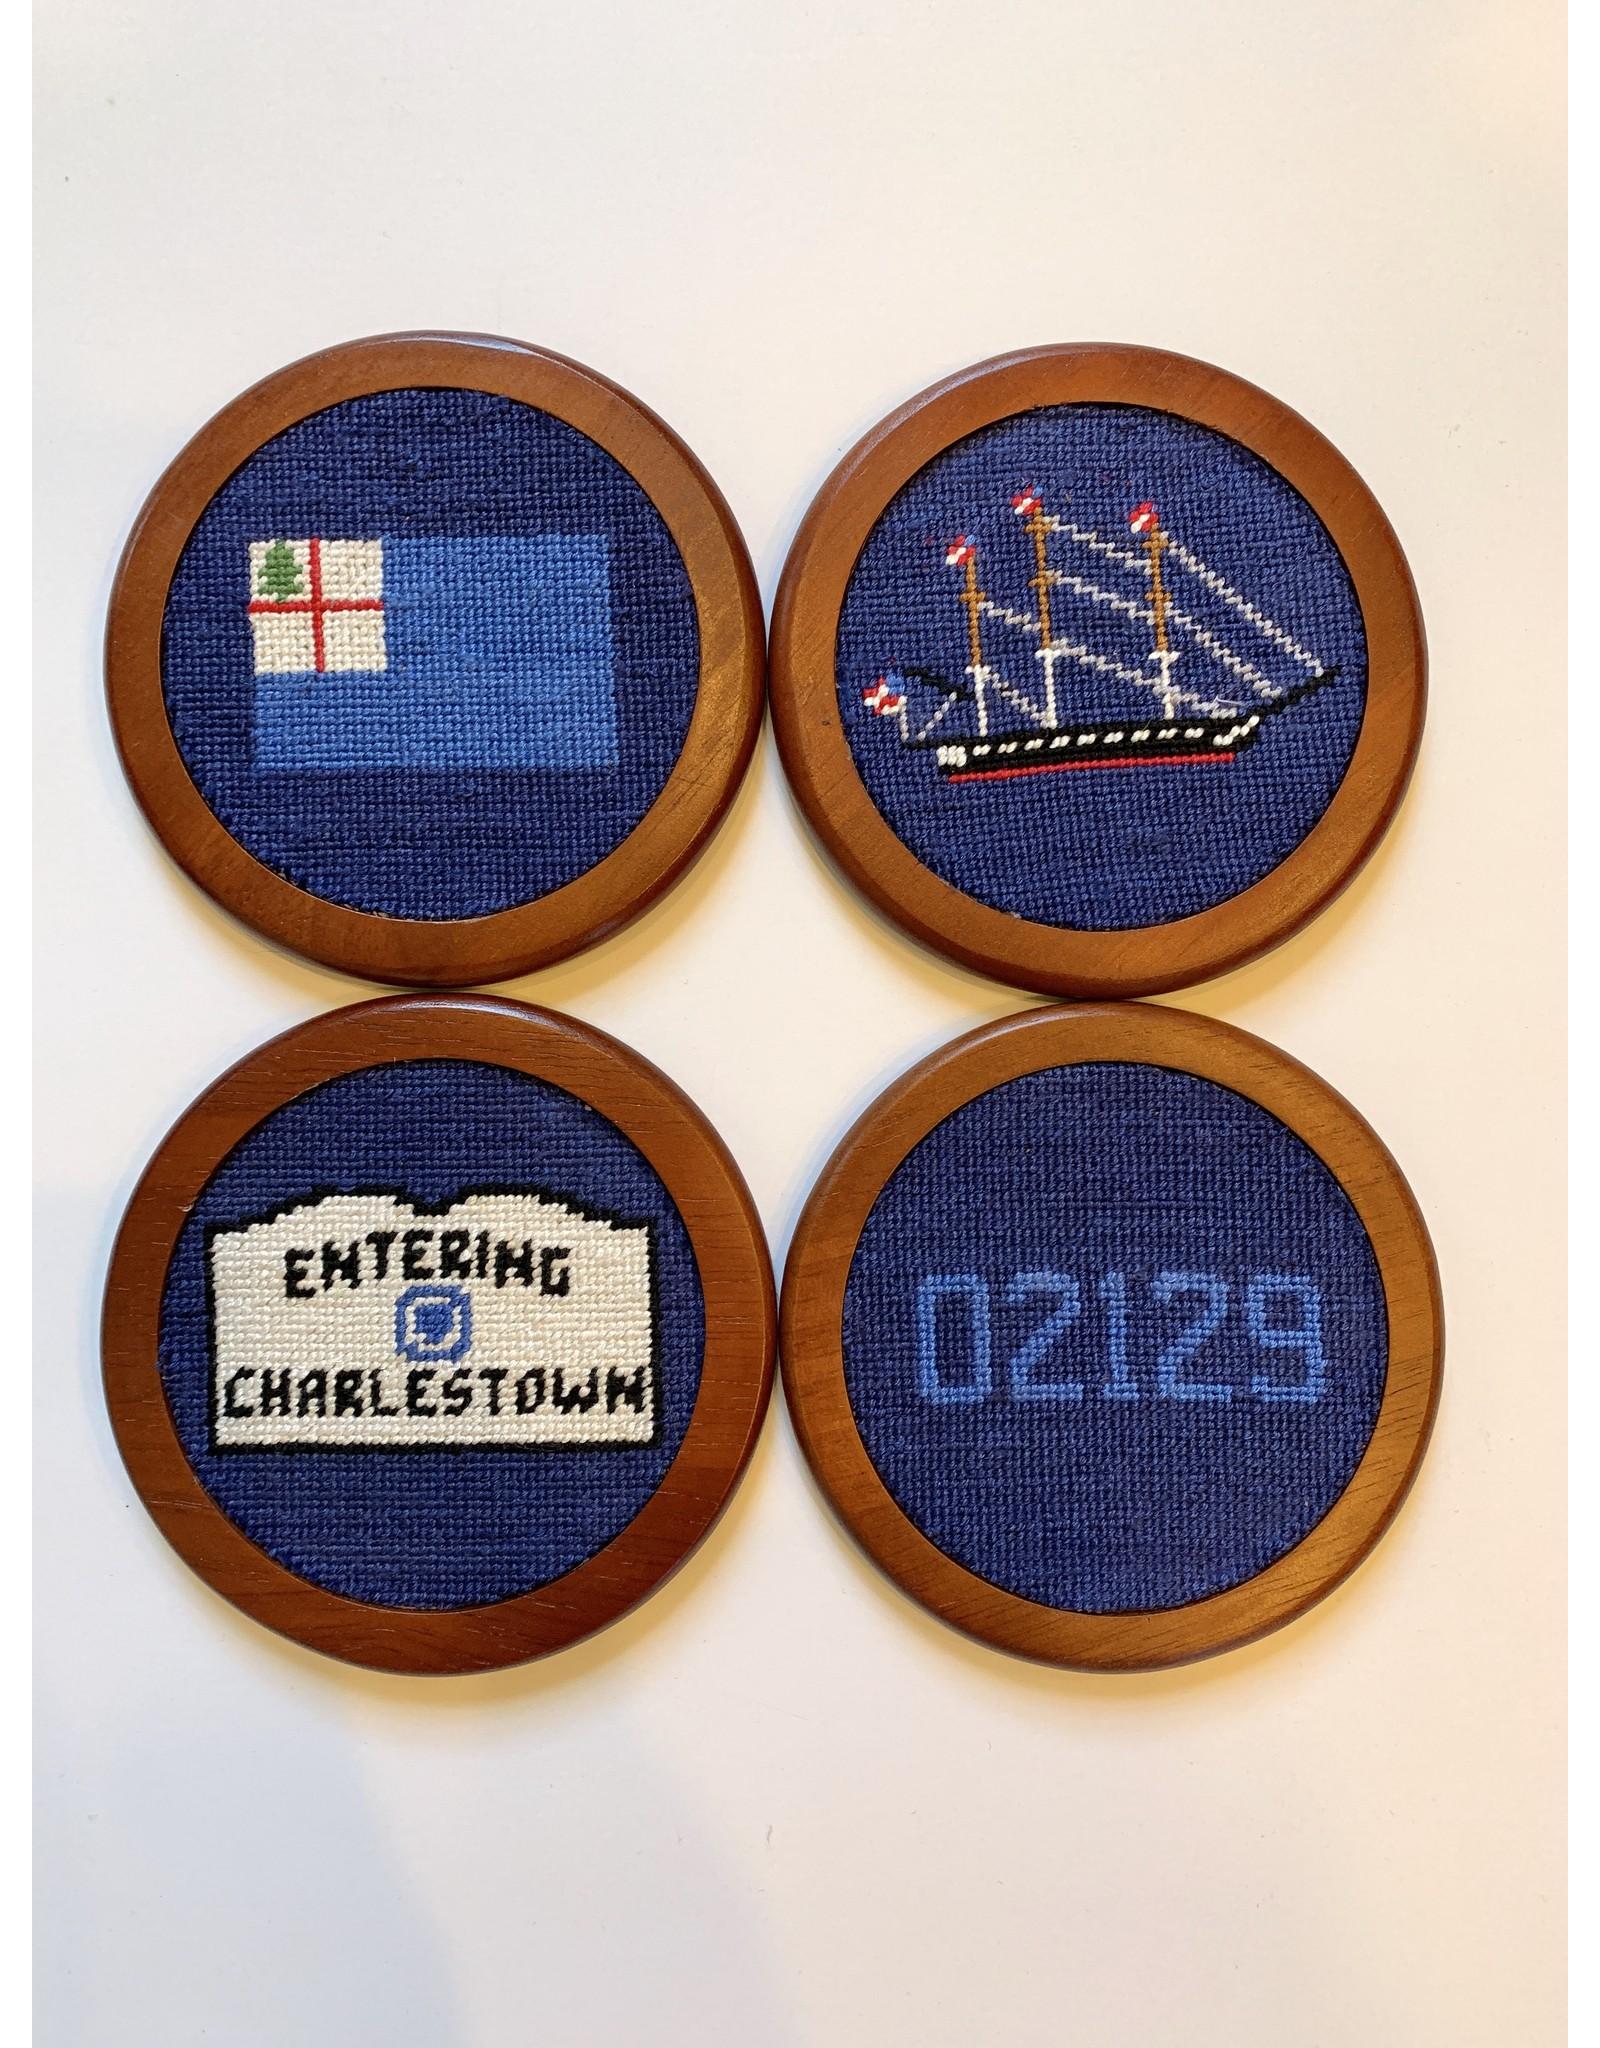 Smathers & Branson Charlestown Coasters